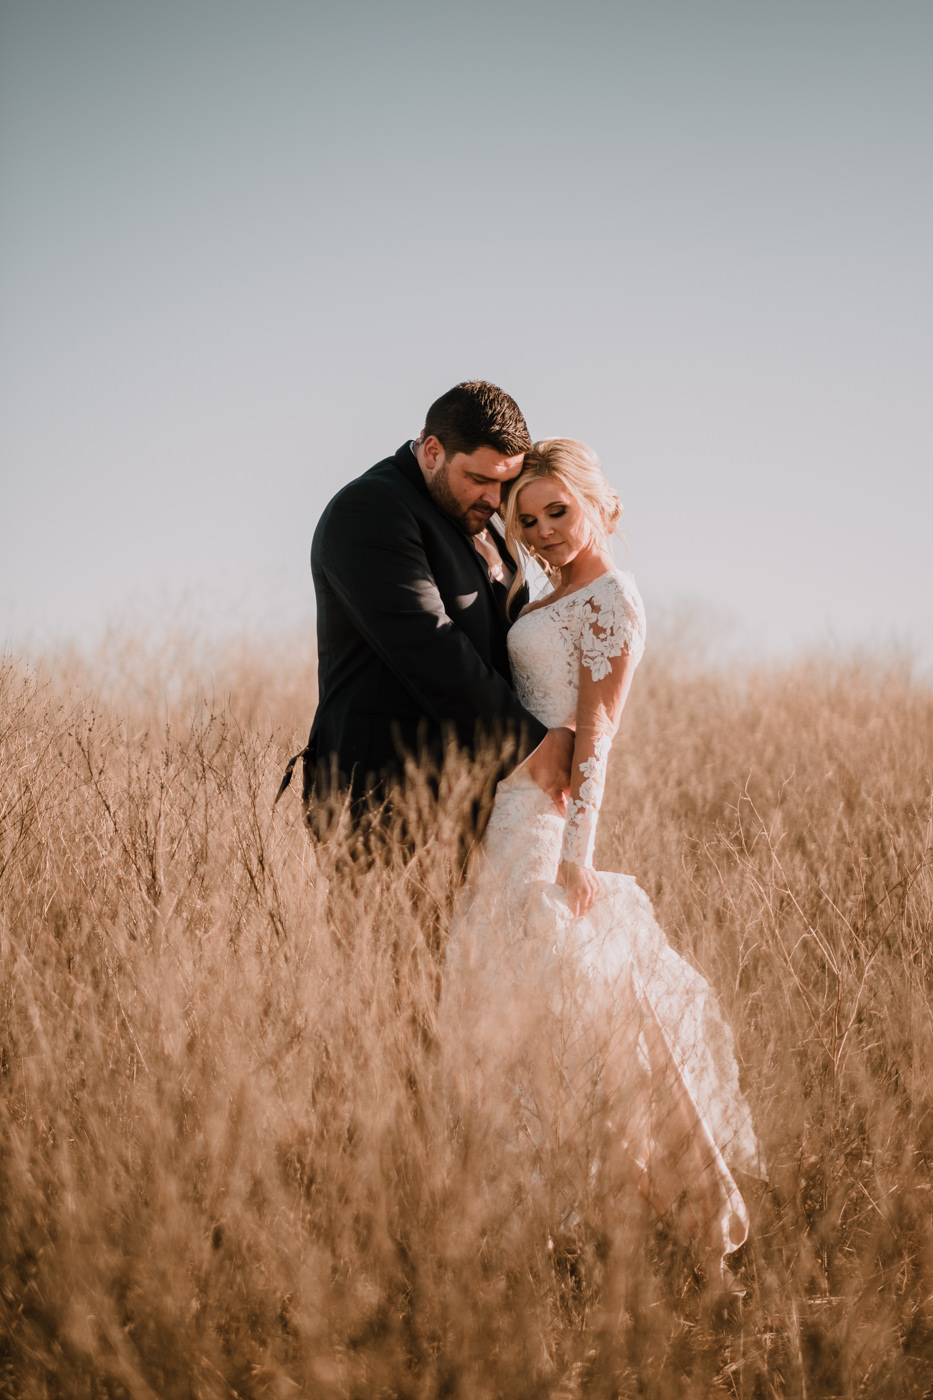 ravington.wedding.northwestarkansas.mileswittboyer-22.jpg